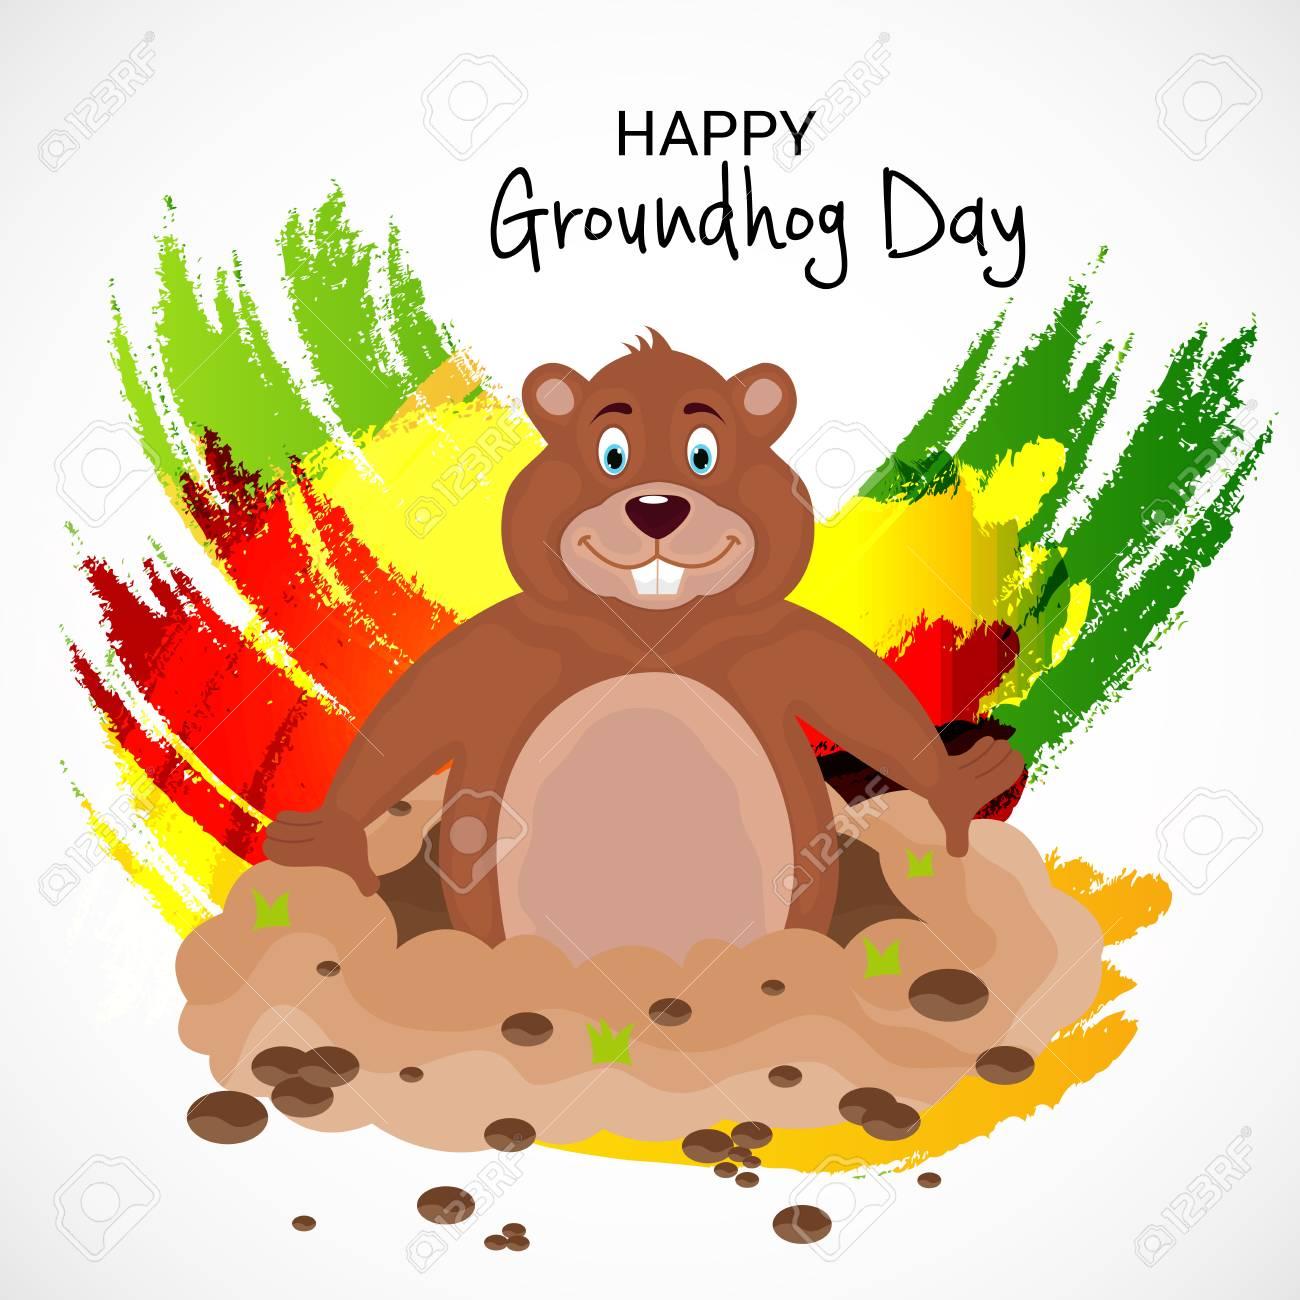 Happy Groundhog Day..